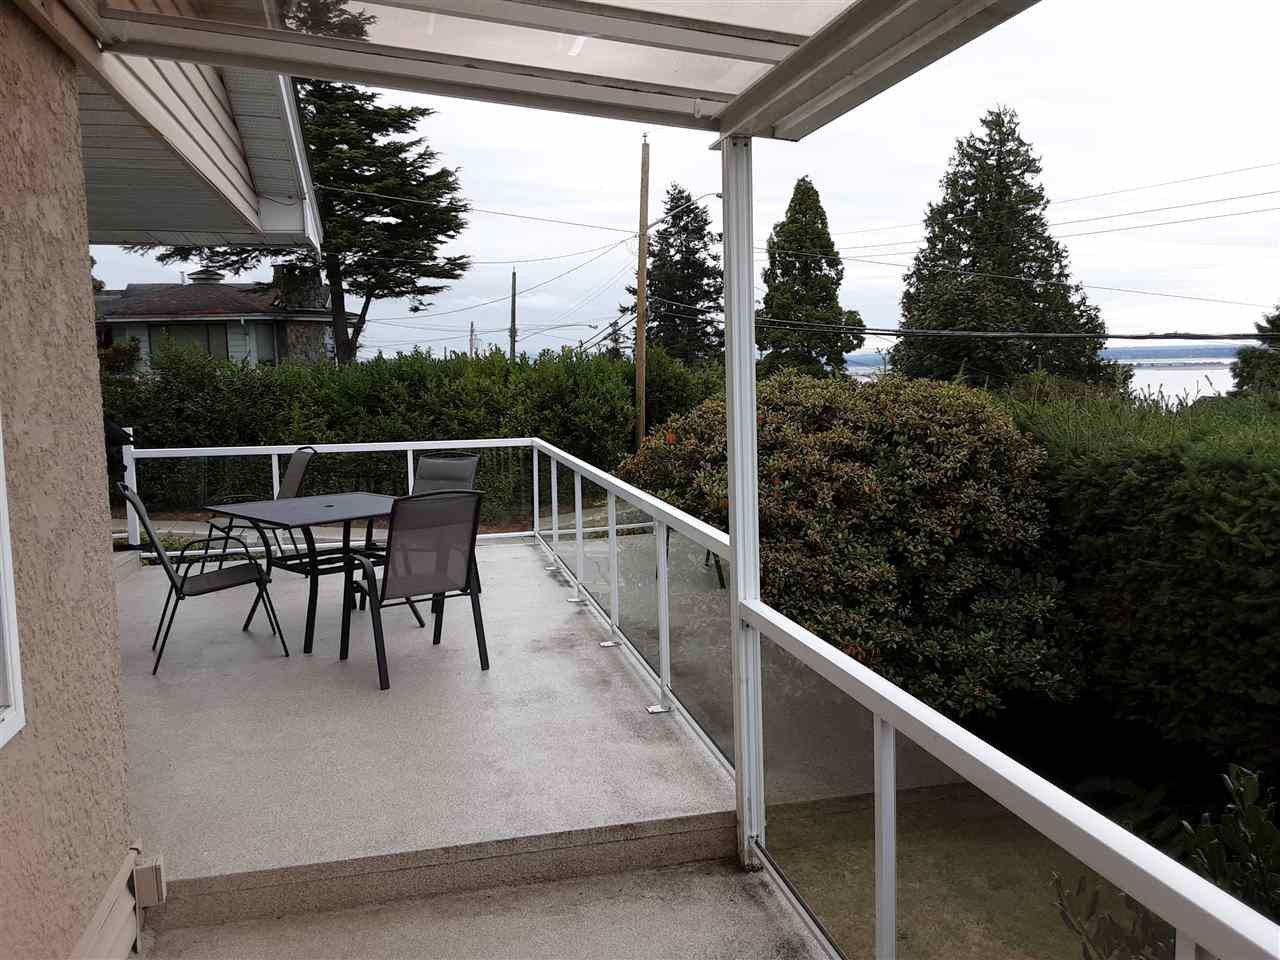 Photo 17: Photos: 15291 COLUMBIA Avenue: White Rock House for sale (South Surrey White Rock)  : MLS®# R2492863